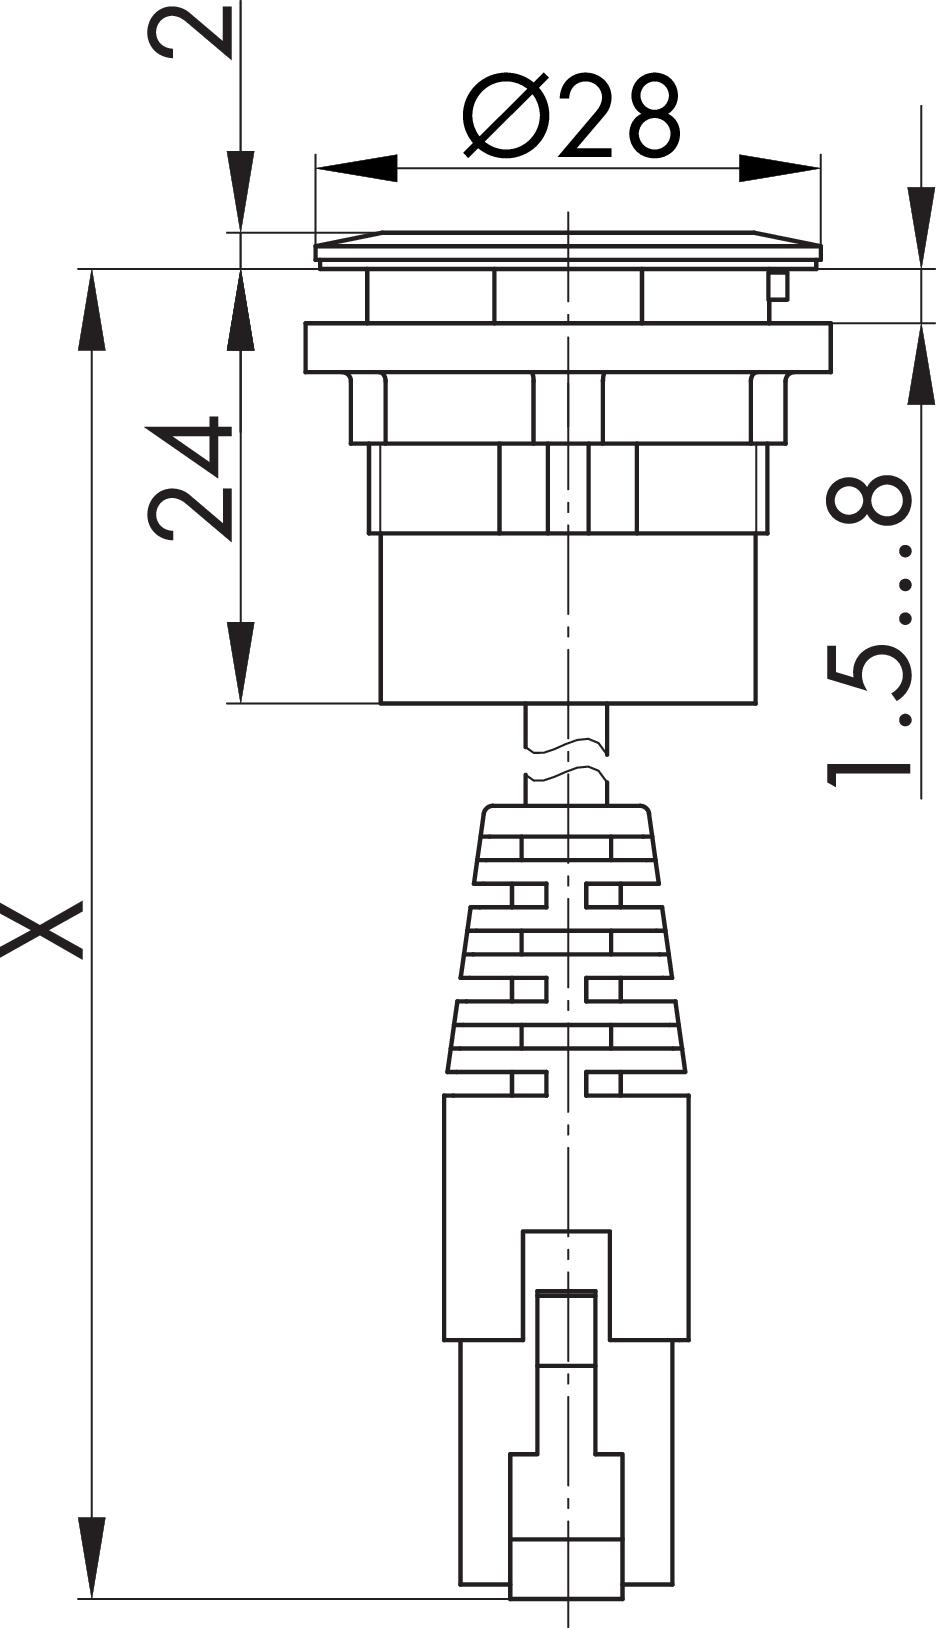 produktkonfigurator schlegel